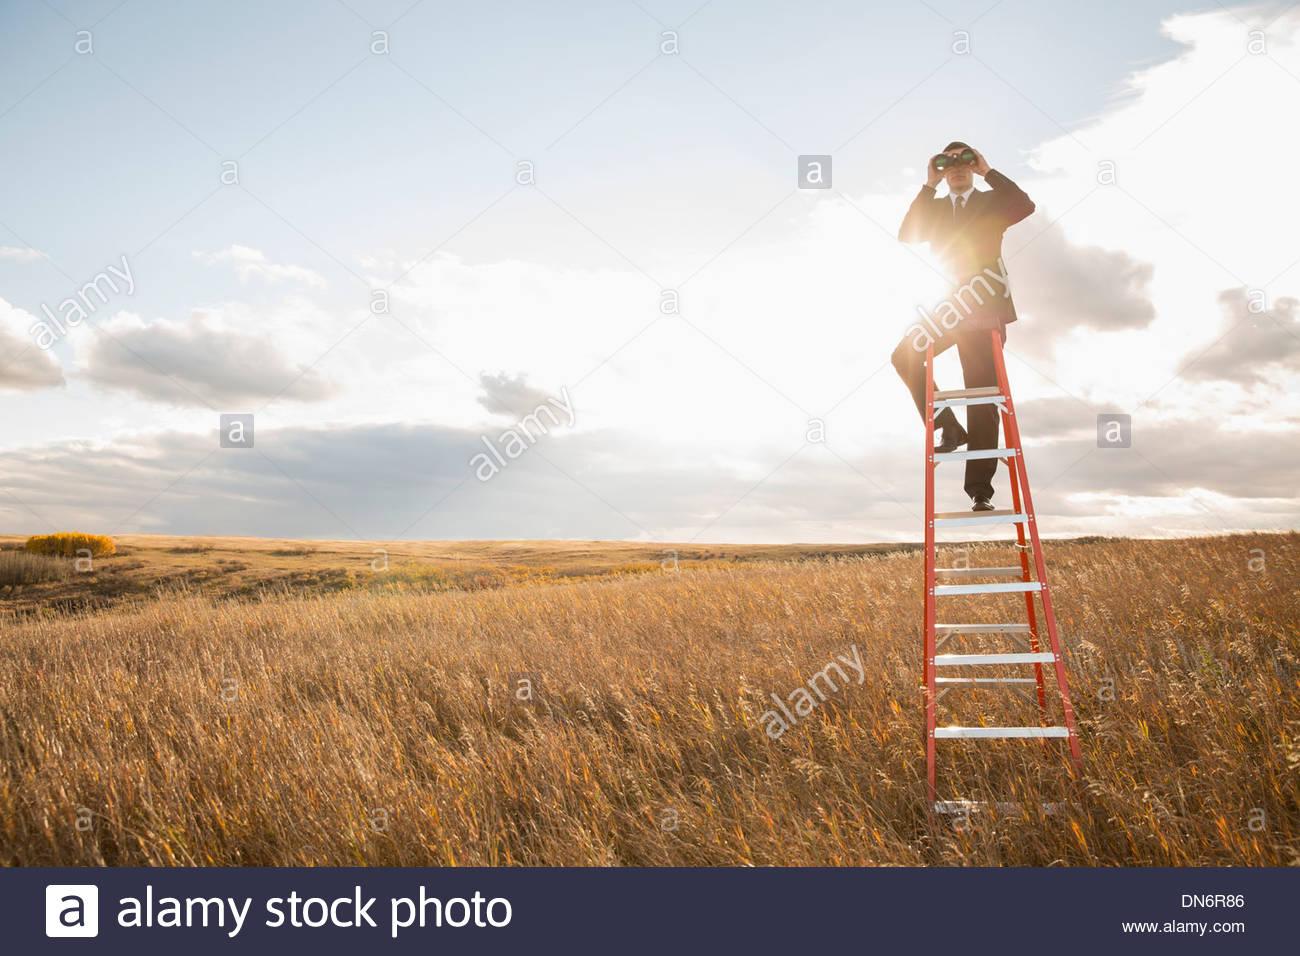 Businessman looking through binoculars on ladder - Stock Image